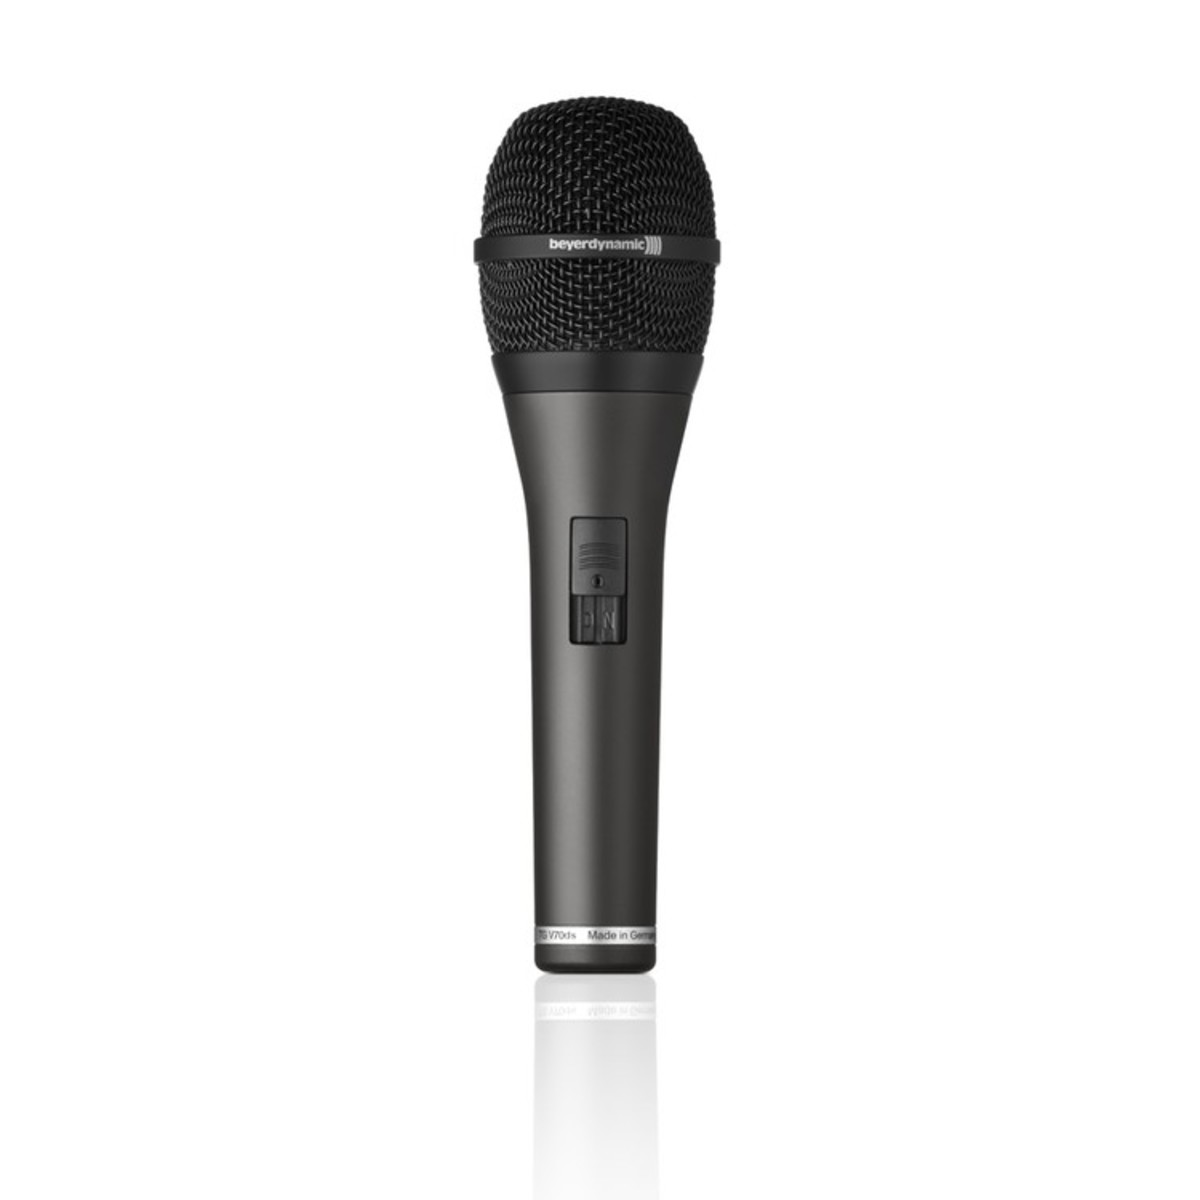 beyerdynamic tg v70d switch professional dynamic vocal mic b stock at gear4music. Black Bedroom Furniture Sets. Home Design Ideas